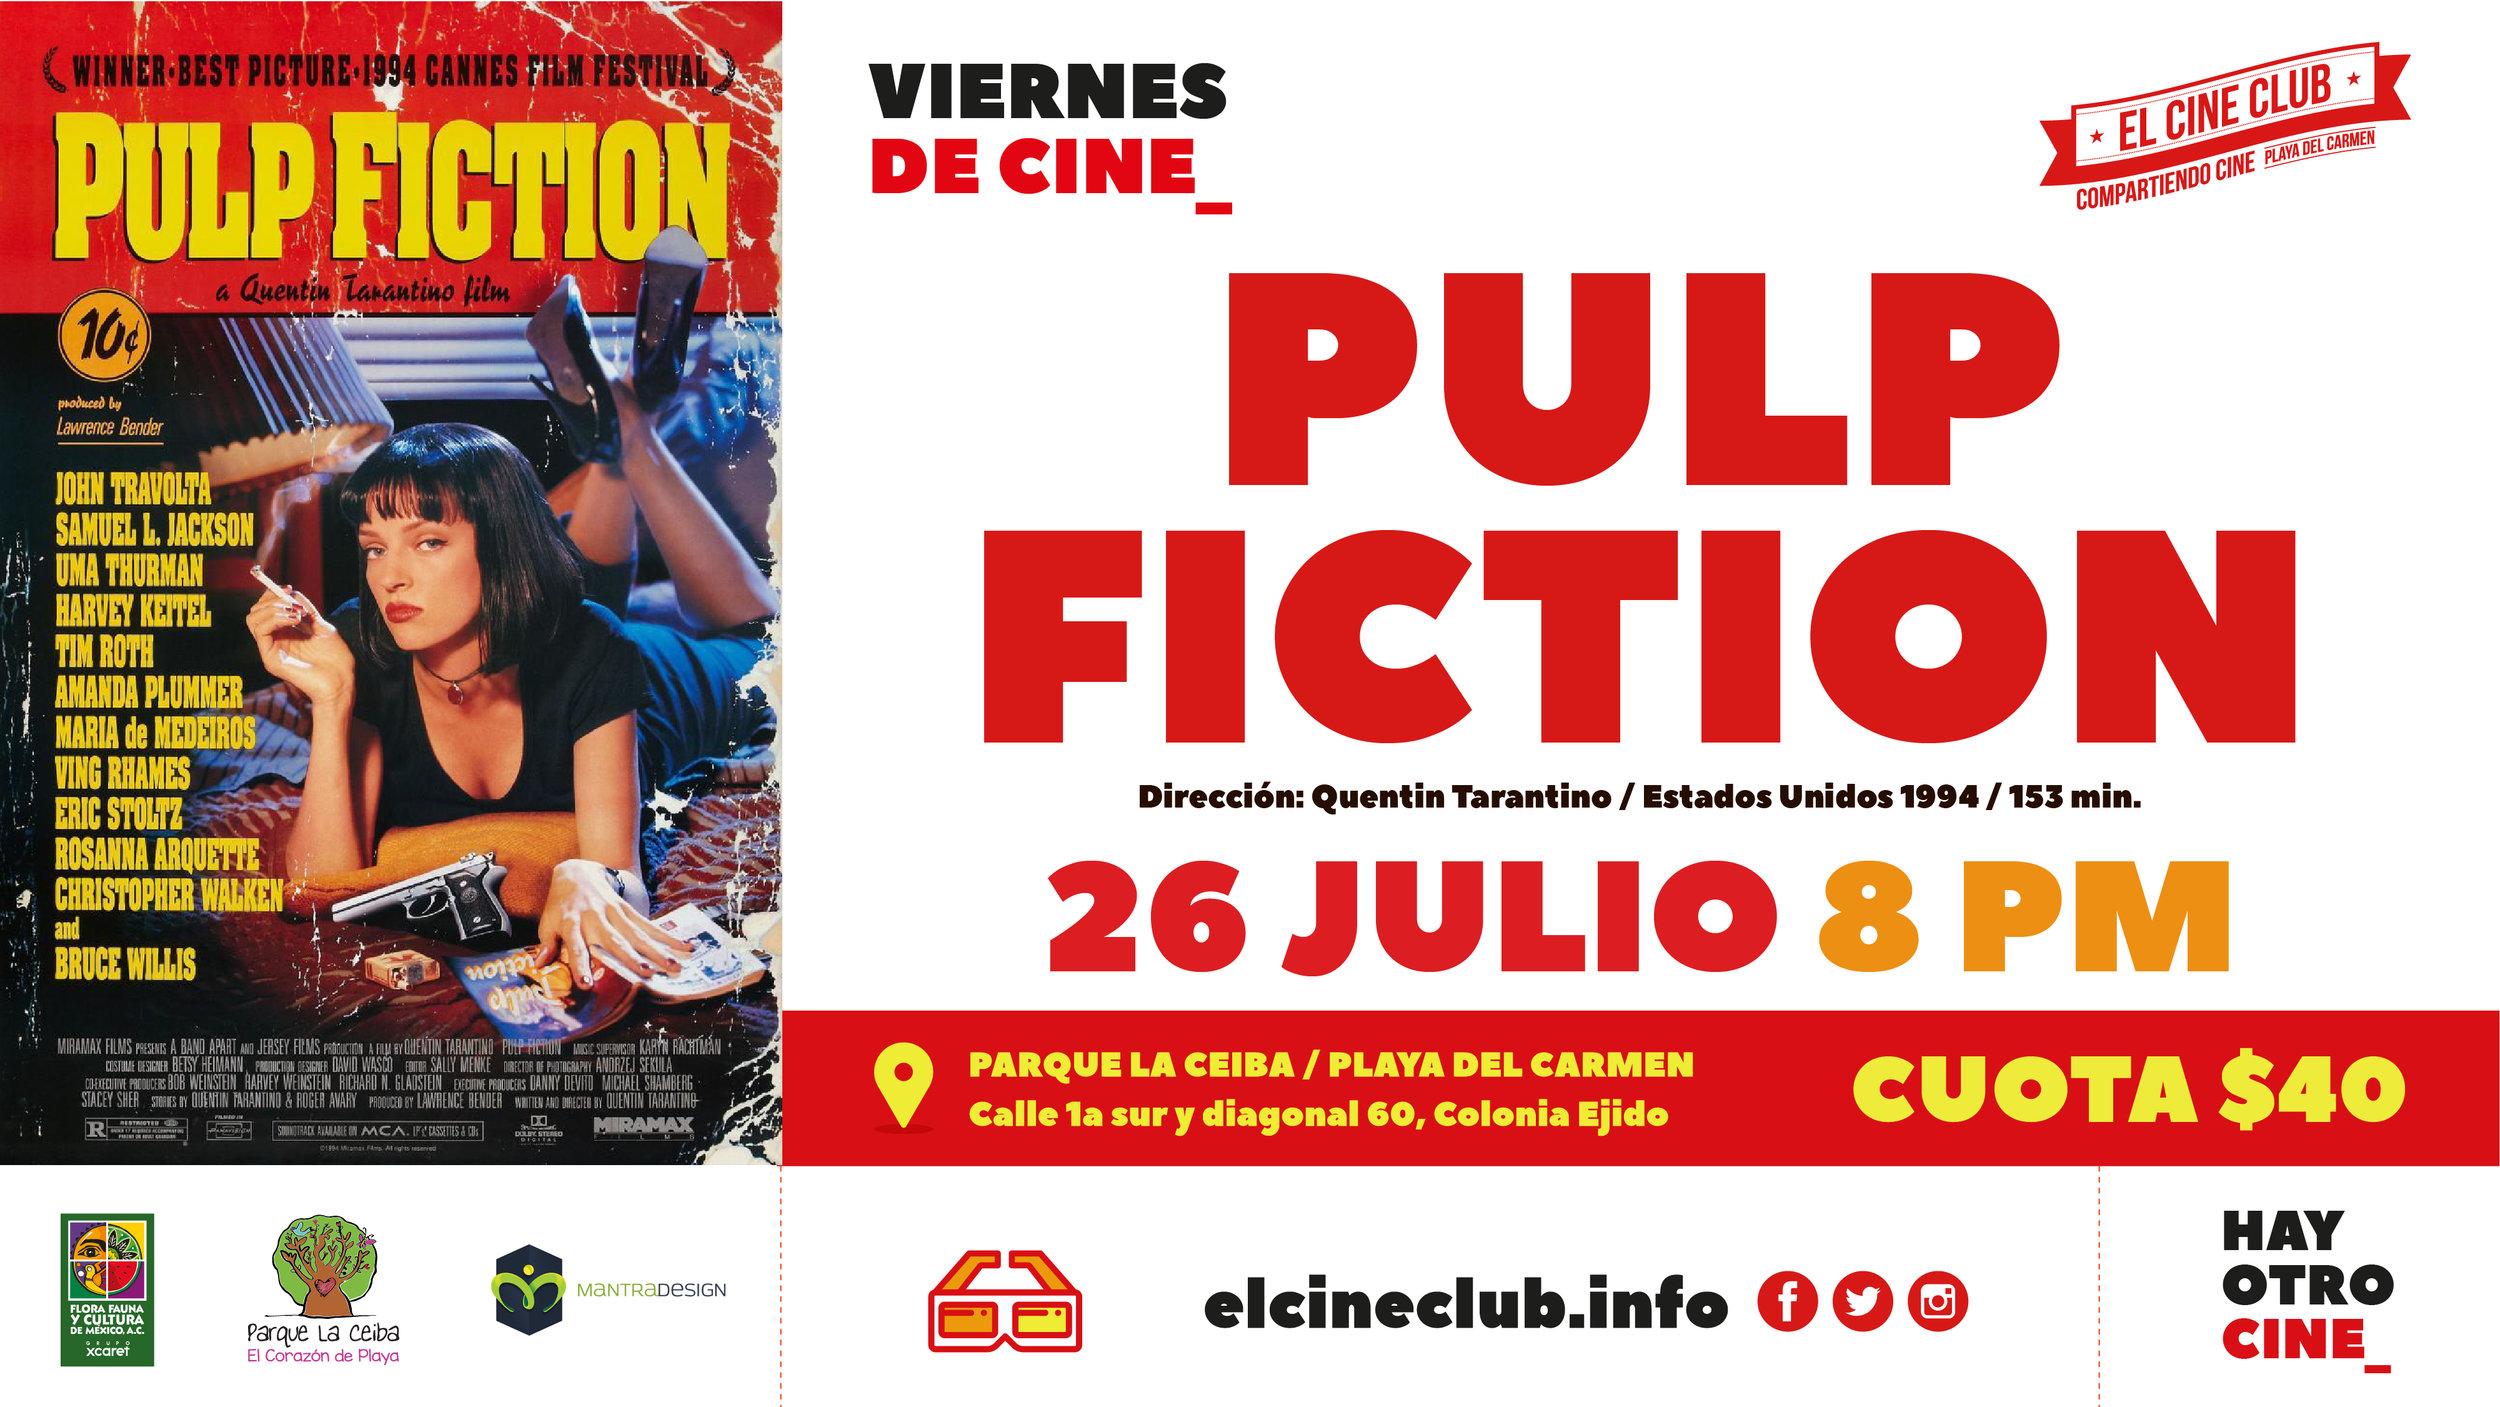 Pulp_Fiction_2019.jpg